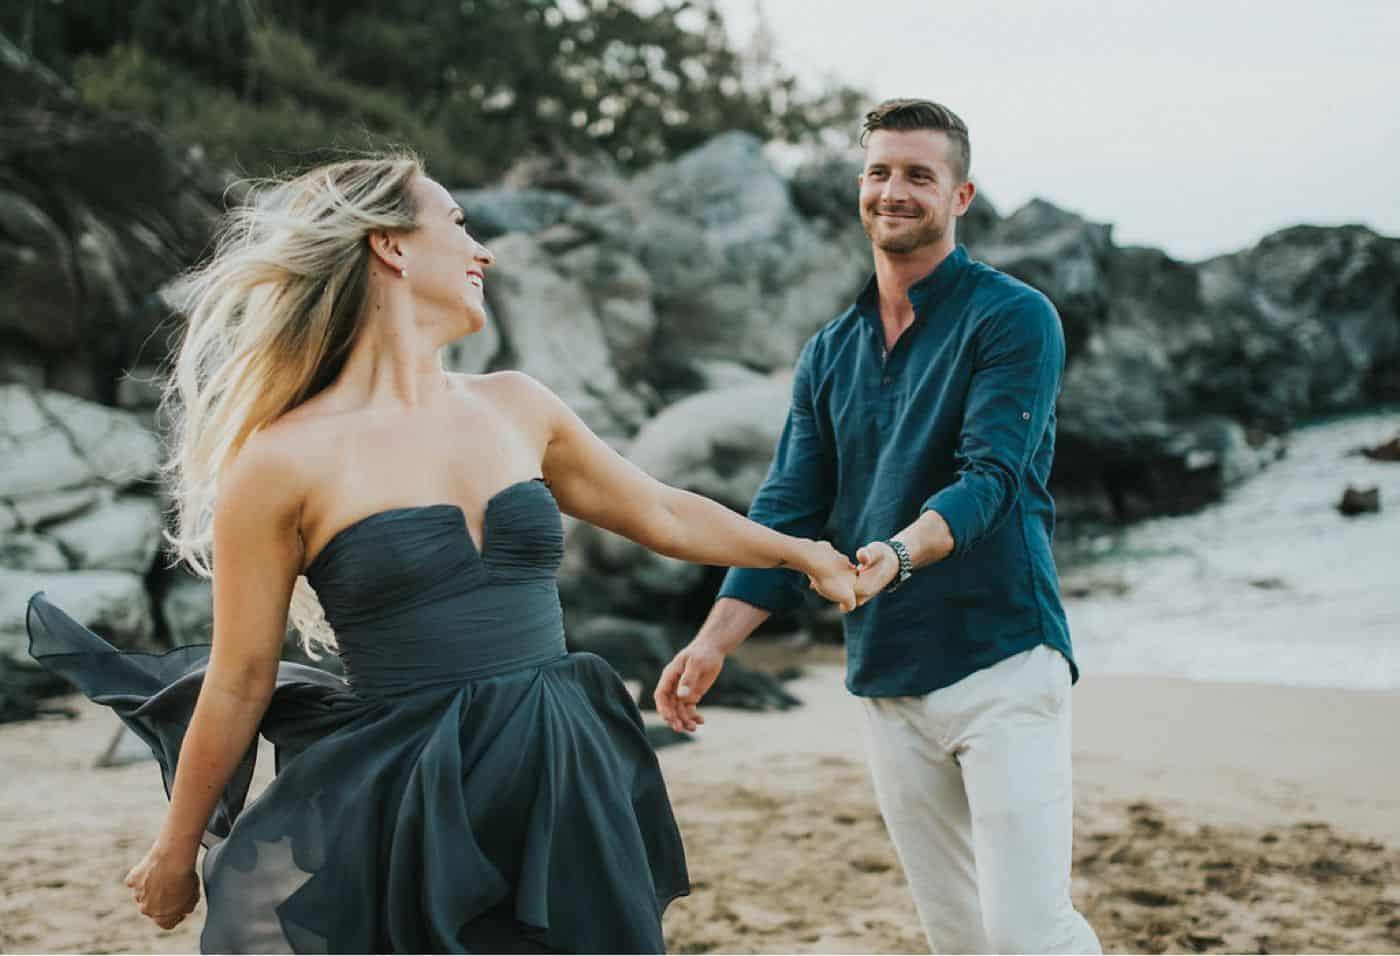 Proposal Photos Tricks With A Professional Photographer